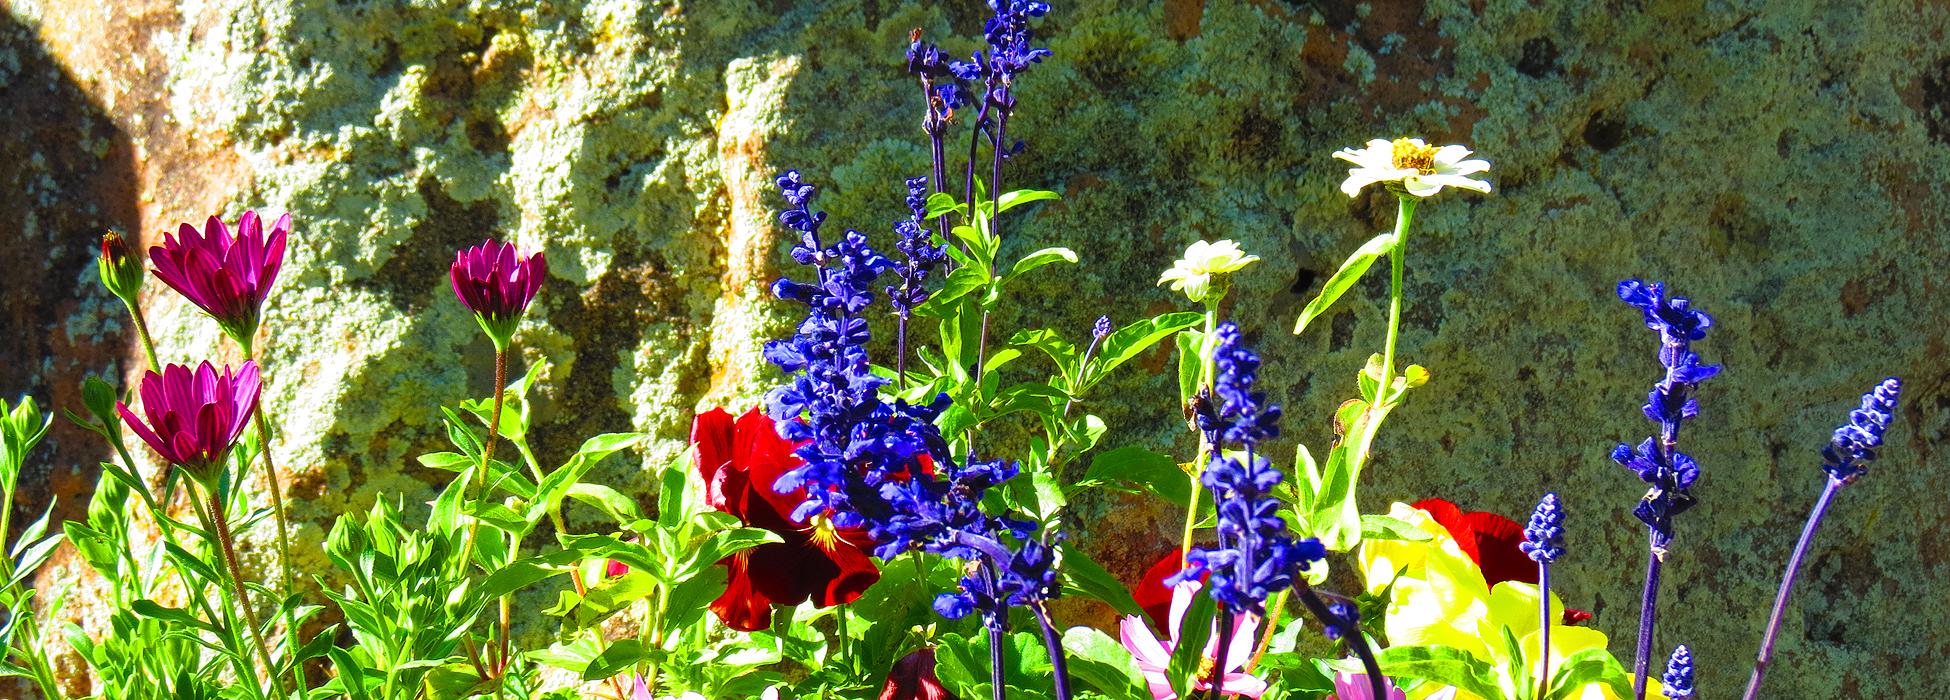 Grassroots Landscaping Gardens in Telluride